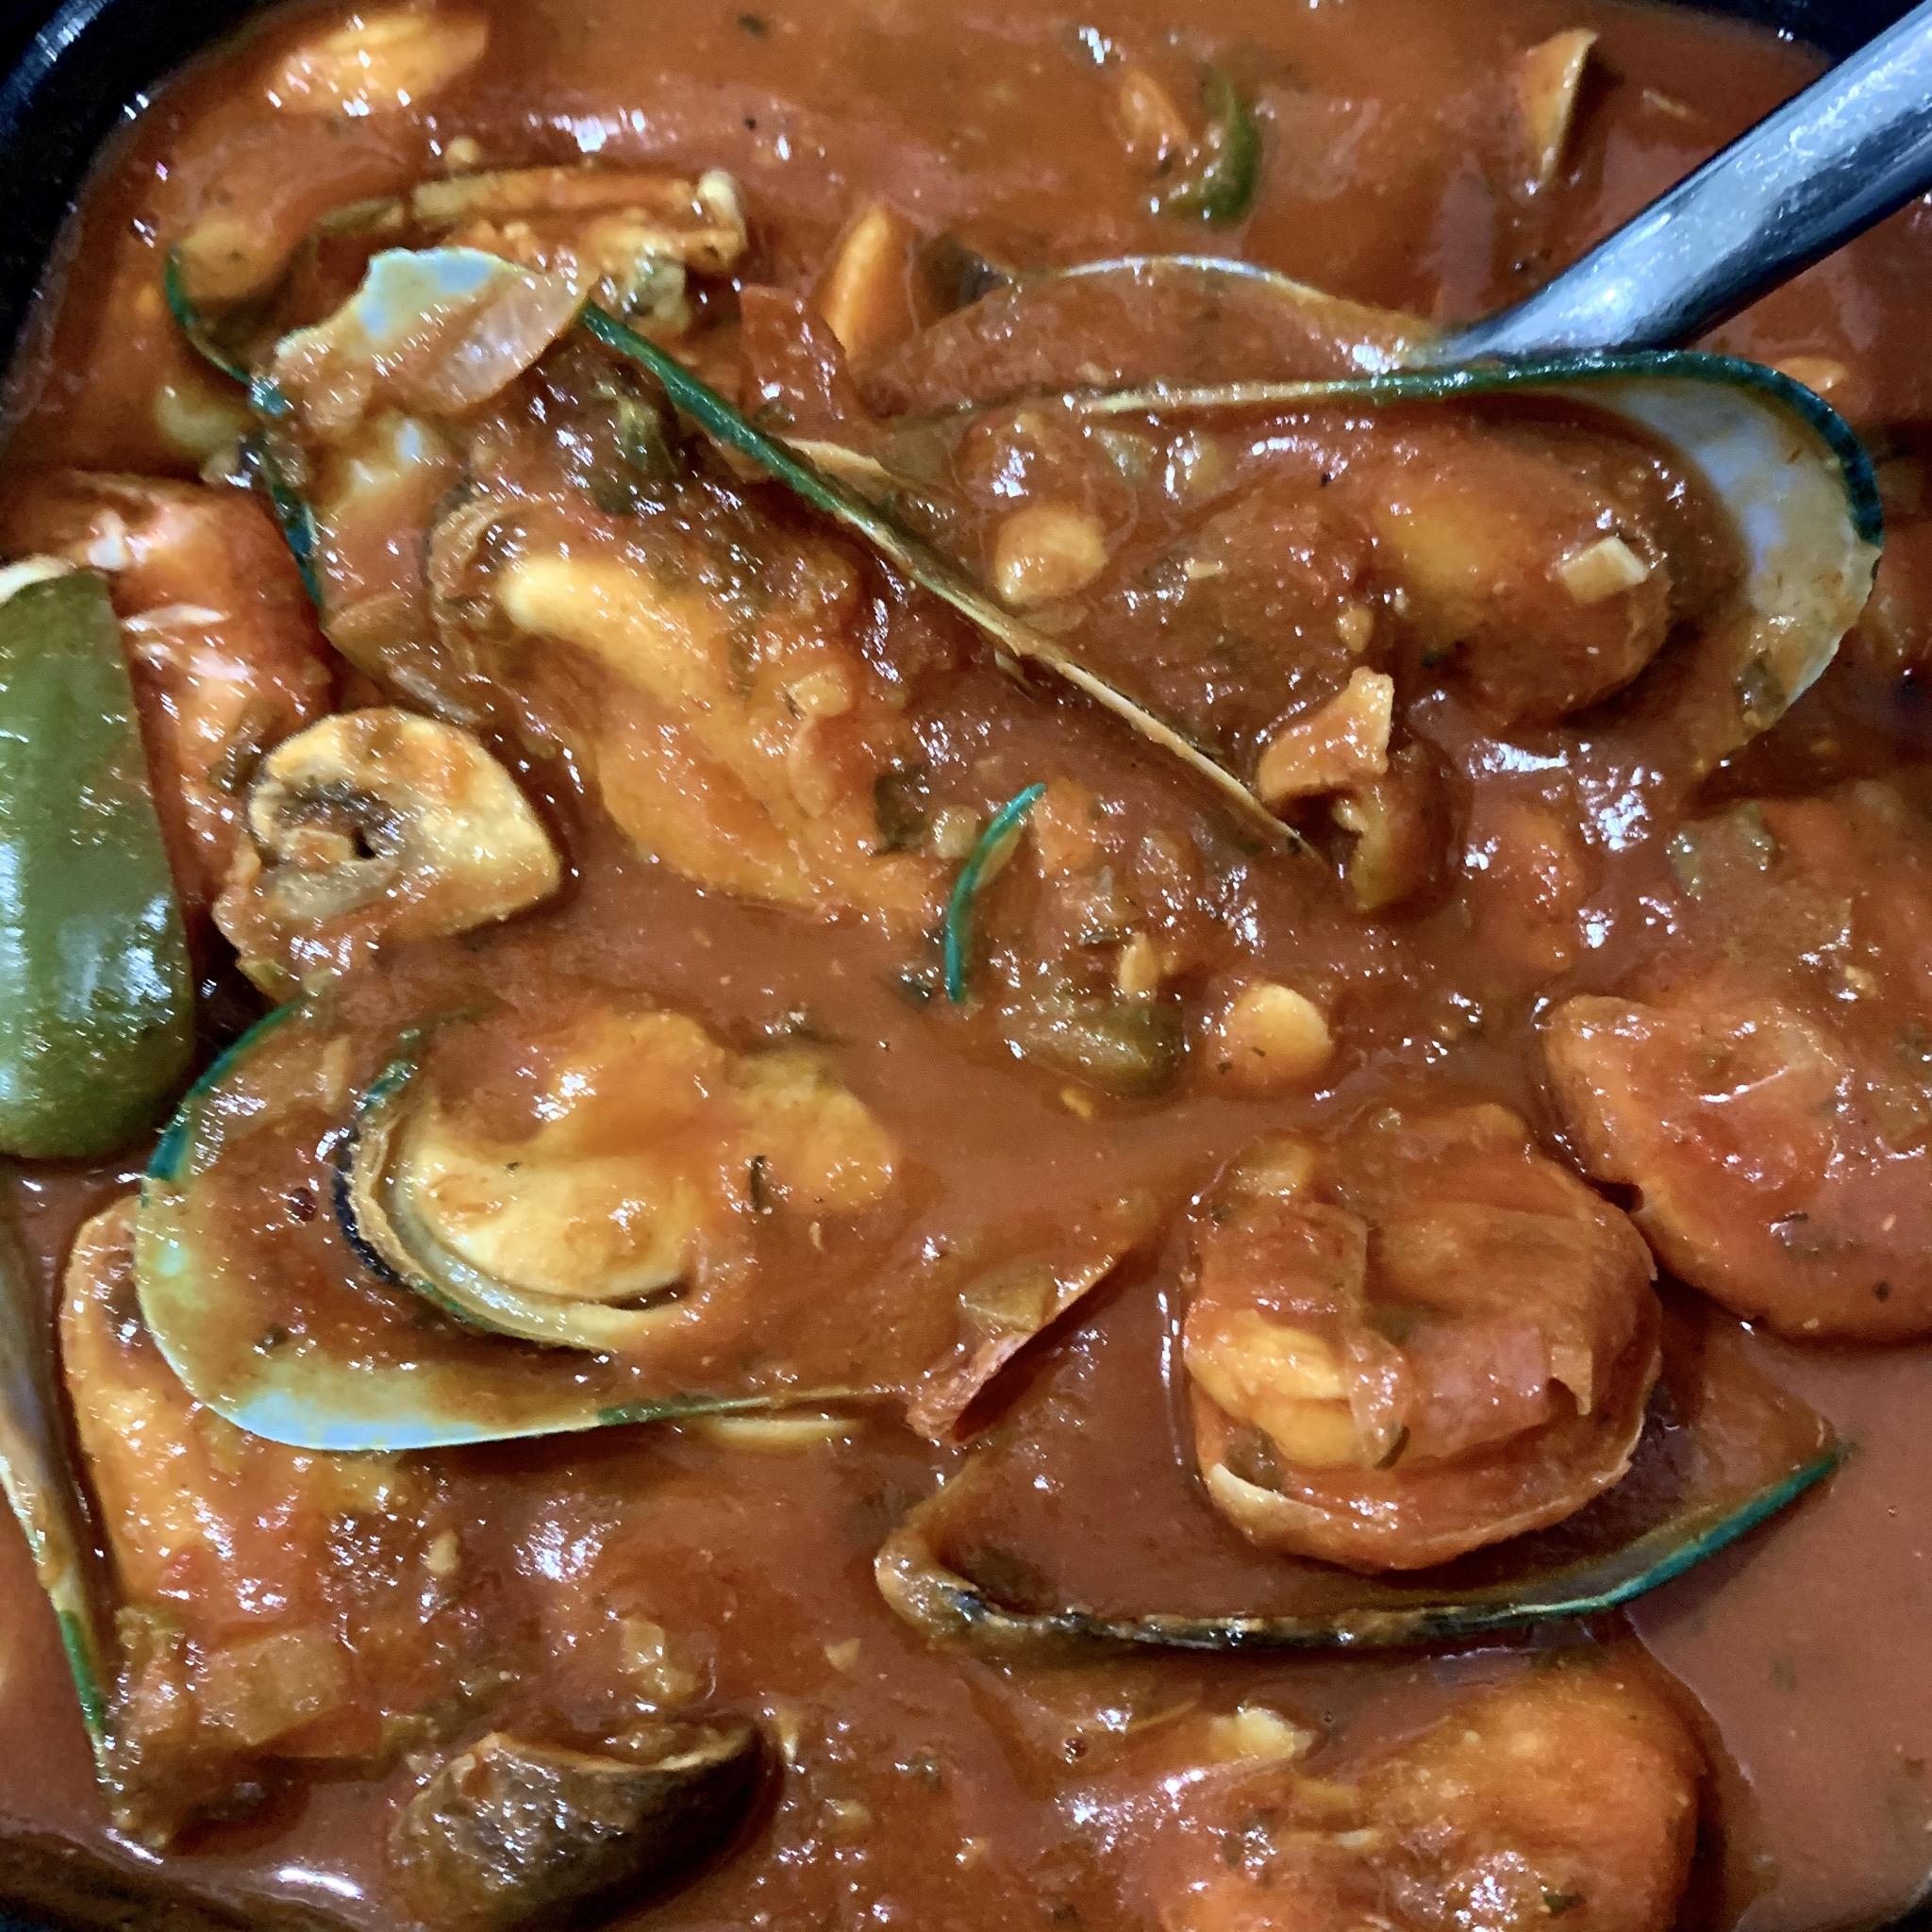 Fisherman's Stew